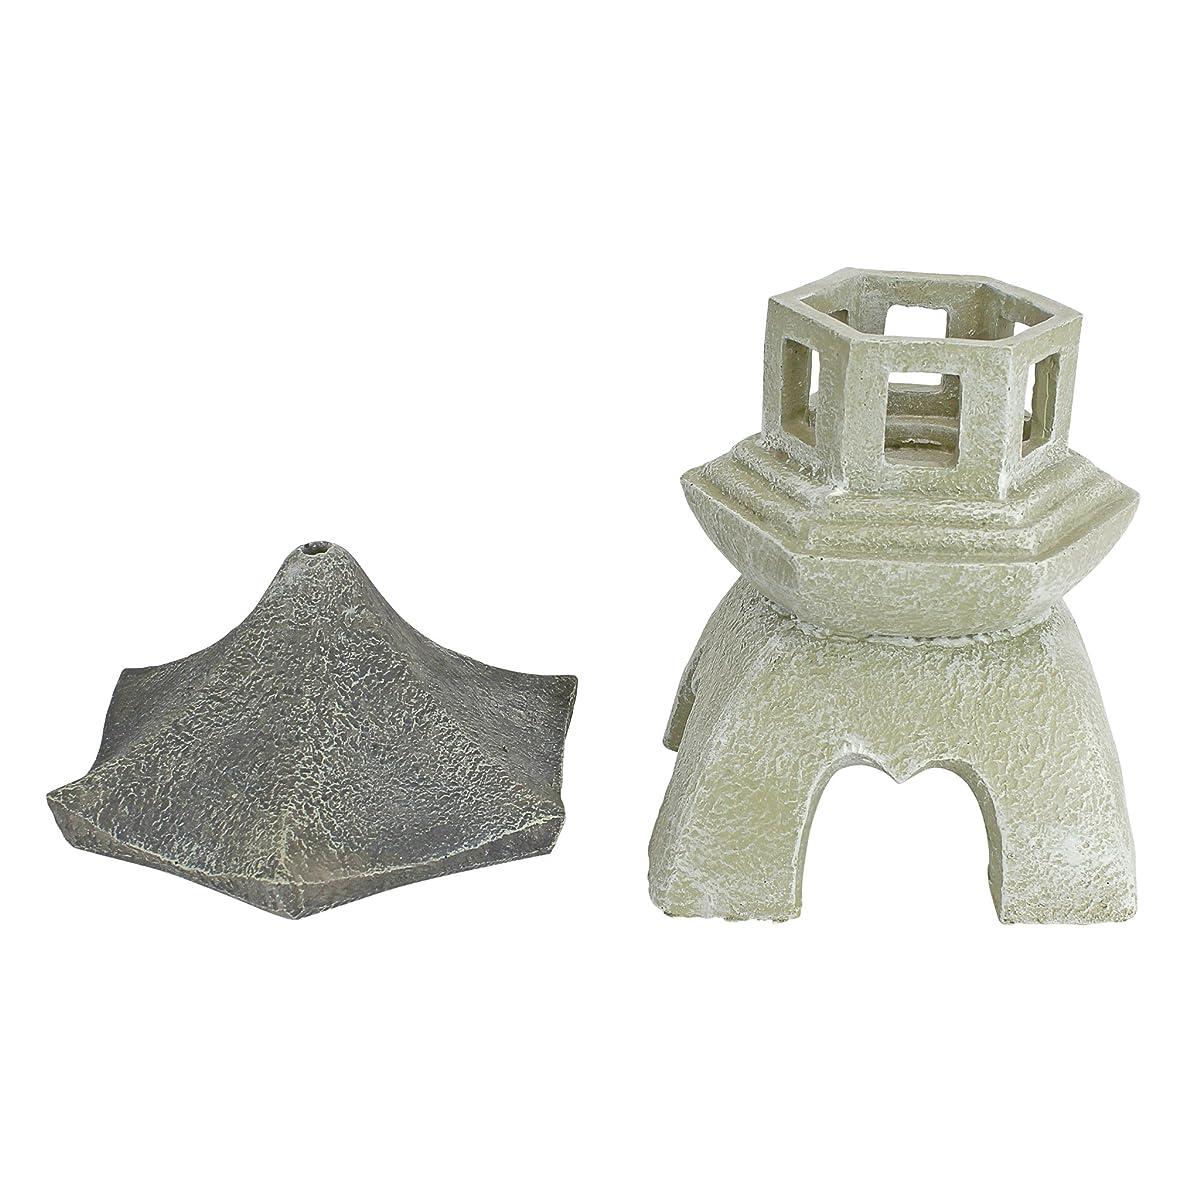 Design Toscano Pagoda Lantern Statue Size: Medium